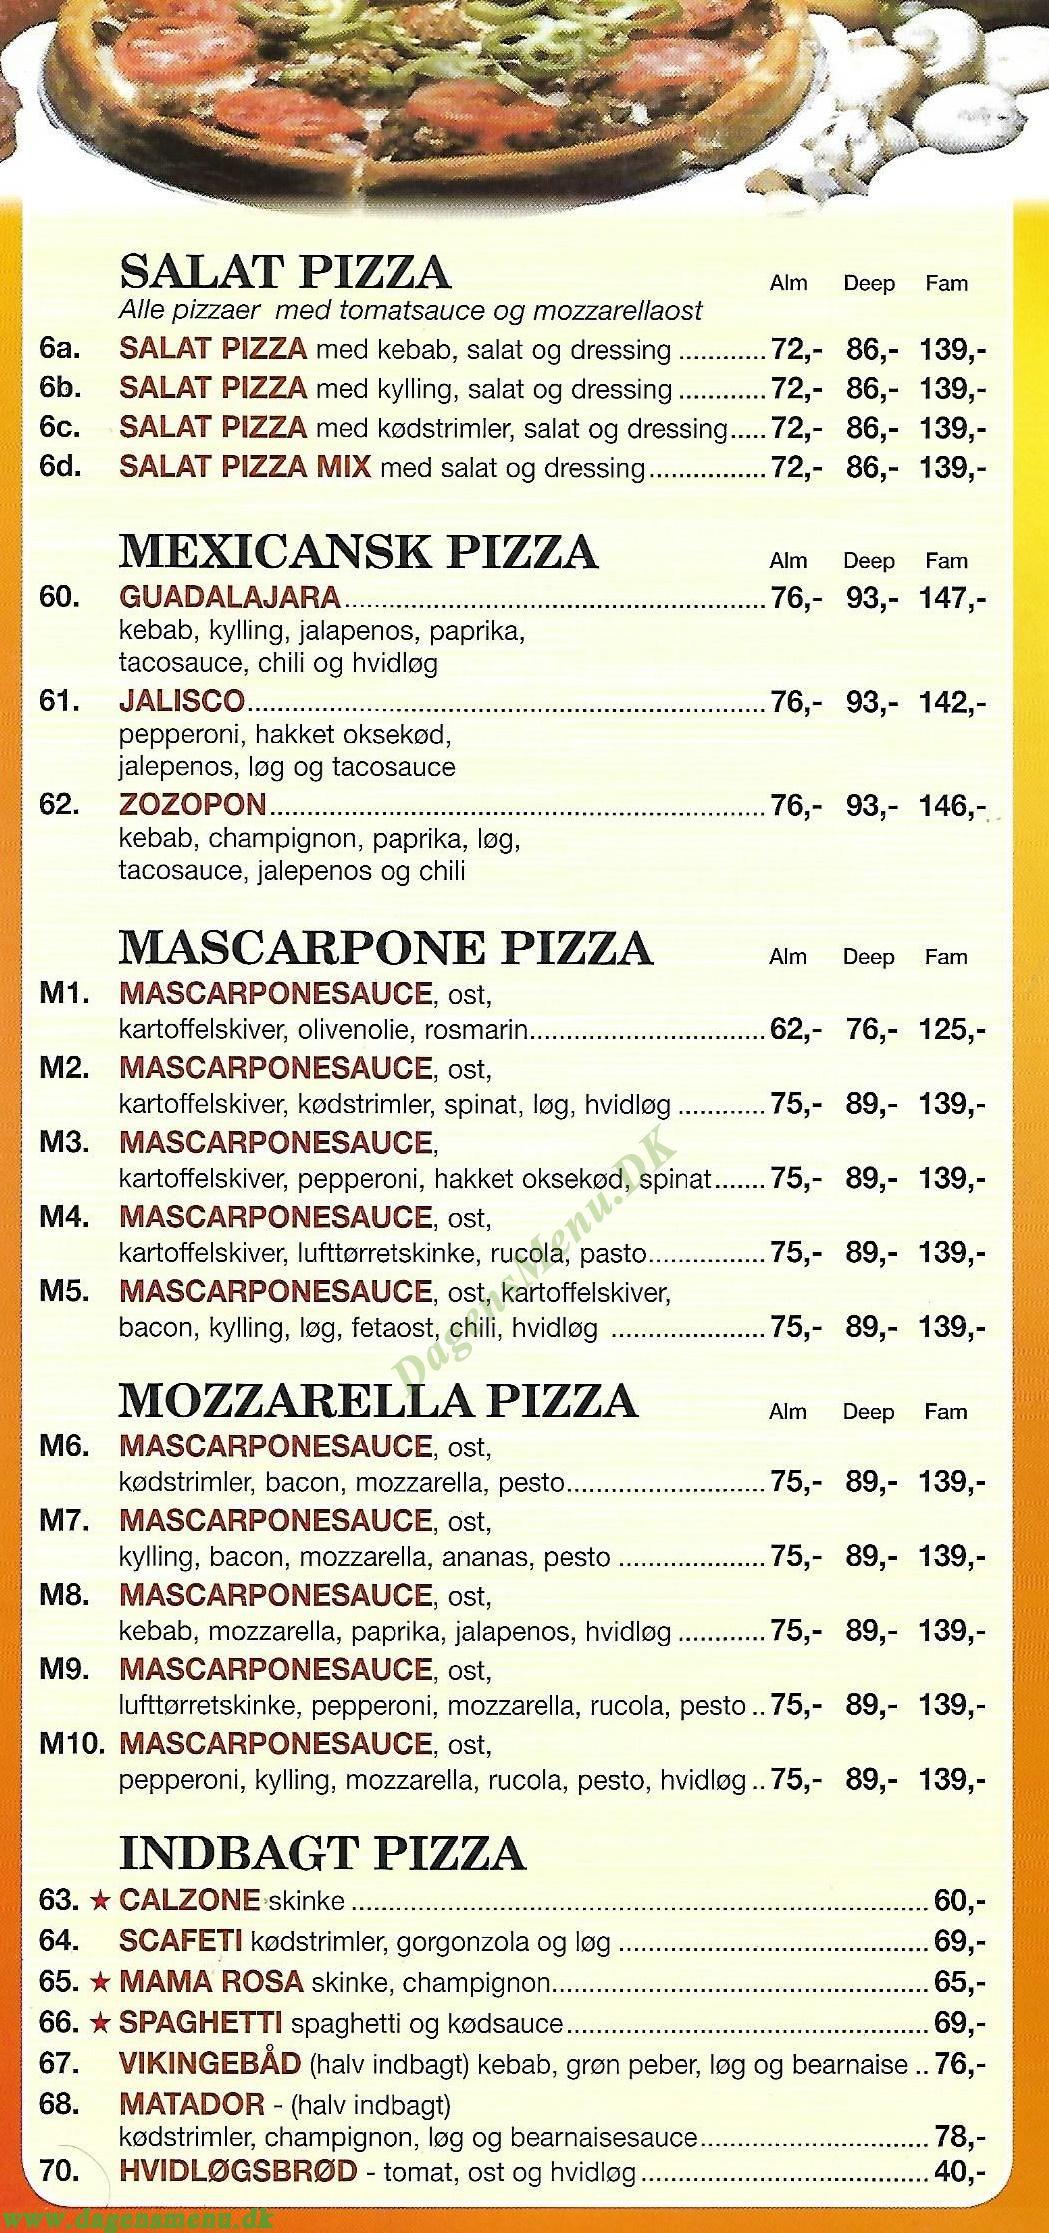 Fiorentina Pizza & Grill - Menukort